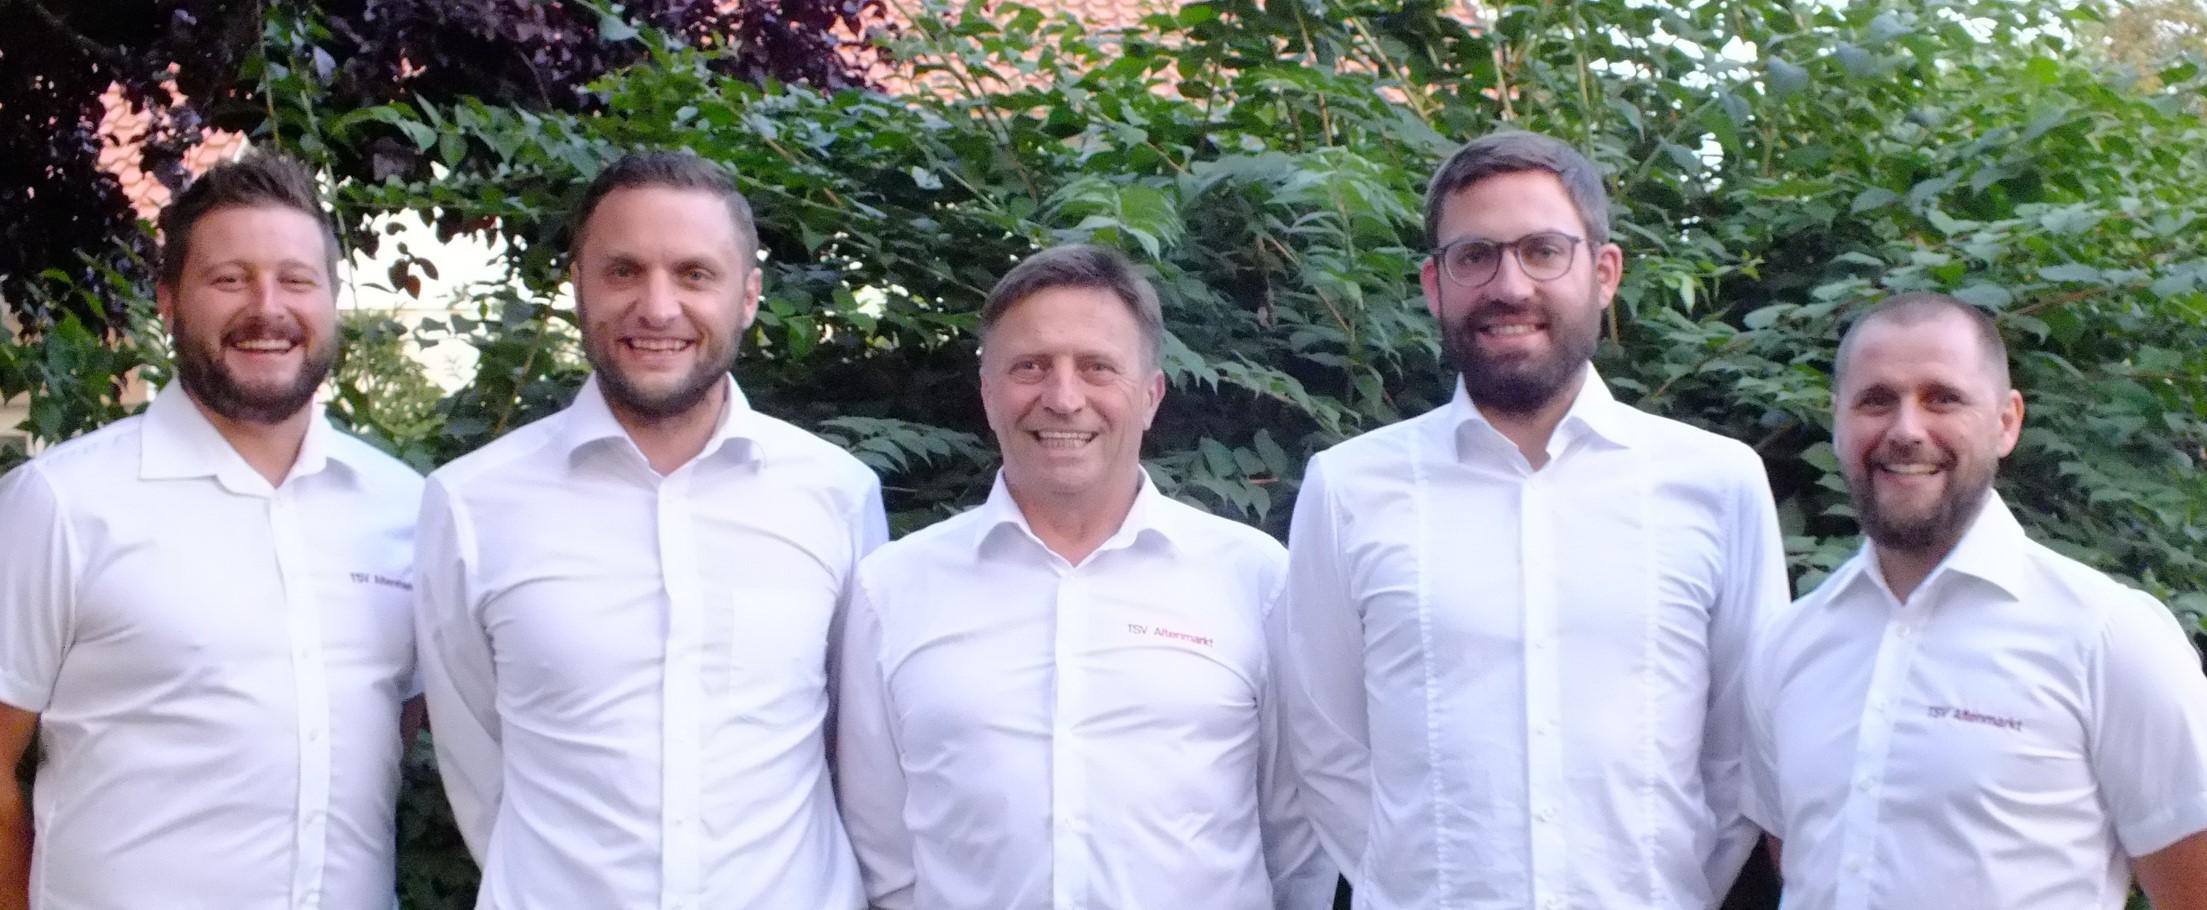 Vorstandschaft 2019